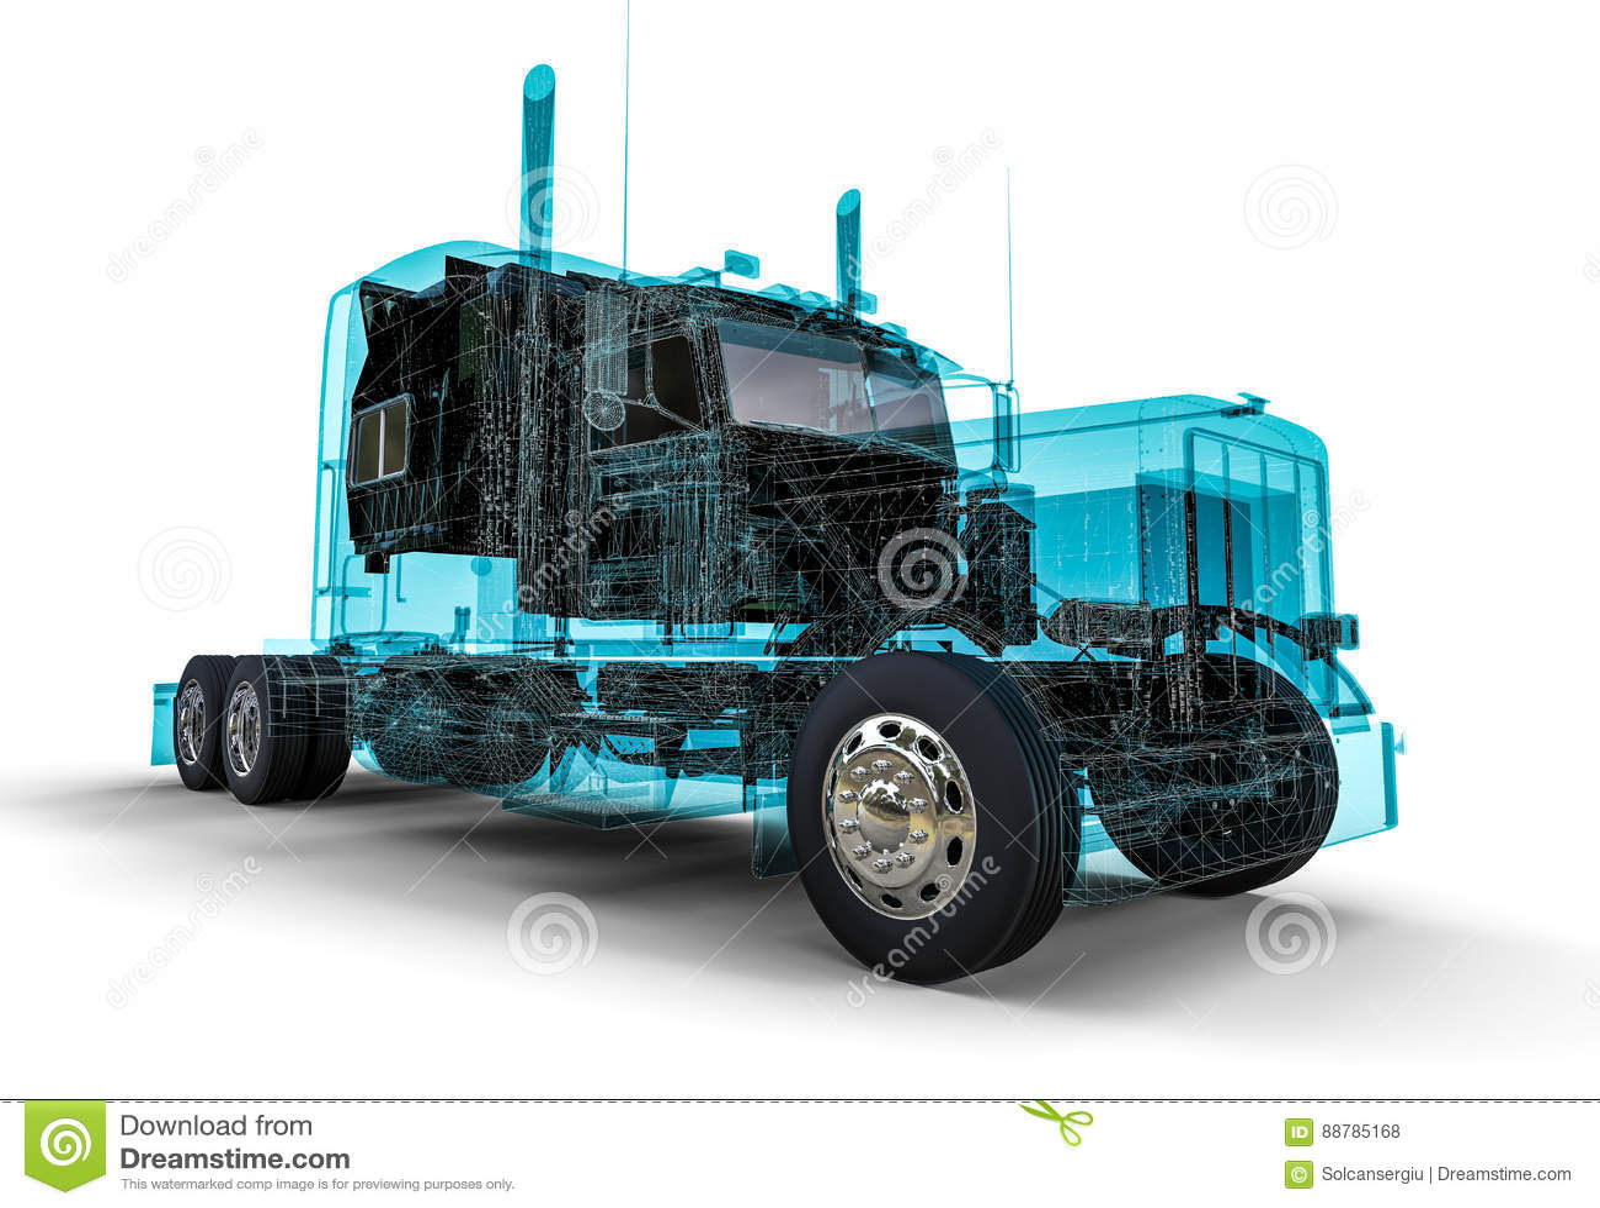 Drahtrahmen Amerikaner-LKW stock abbildung. Illustration von ...